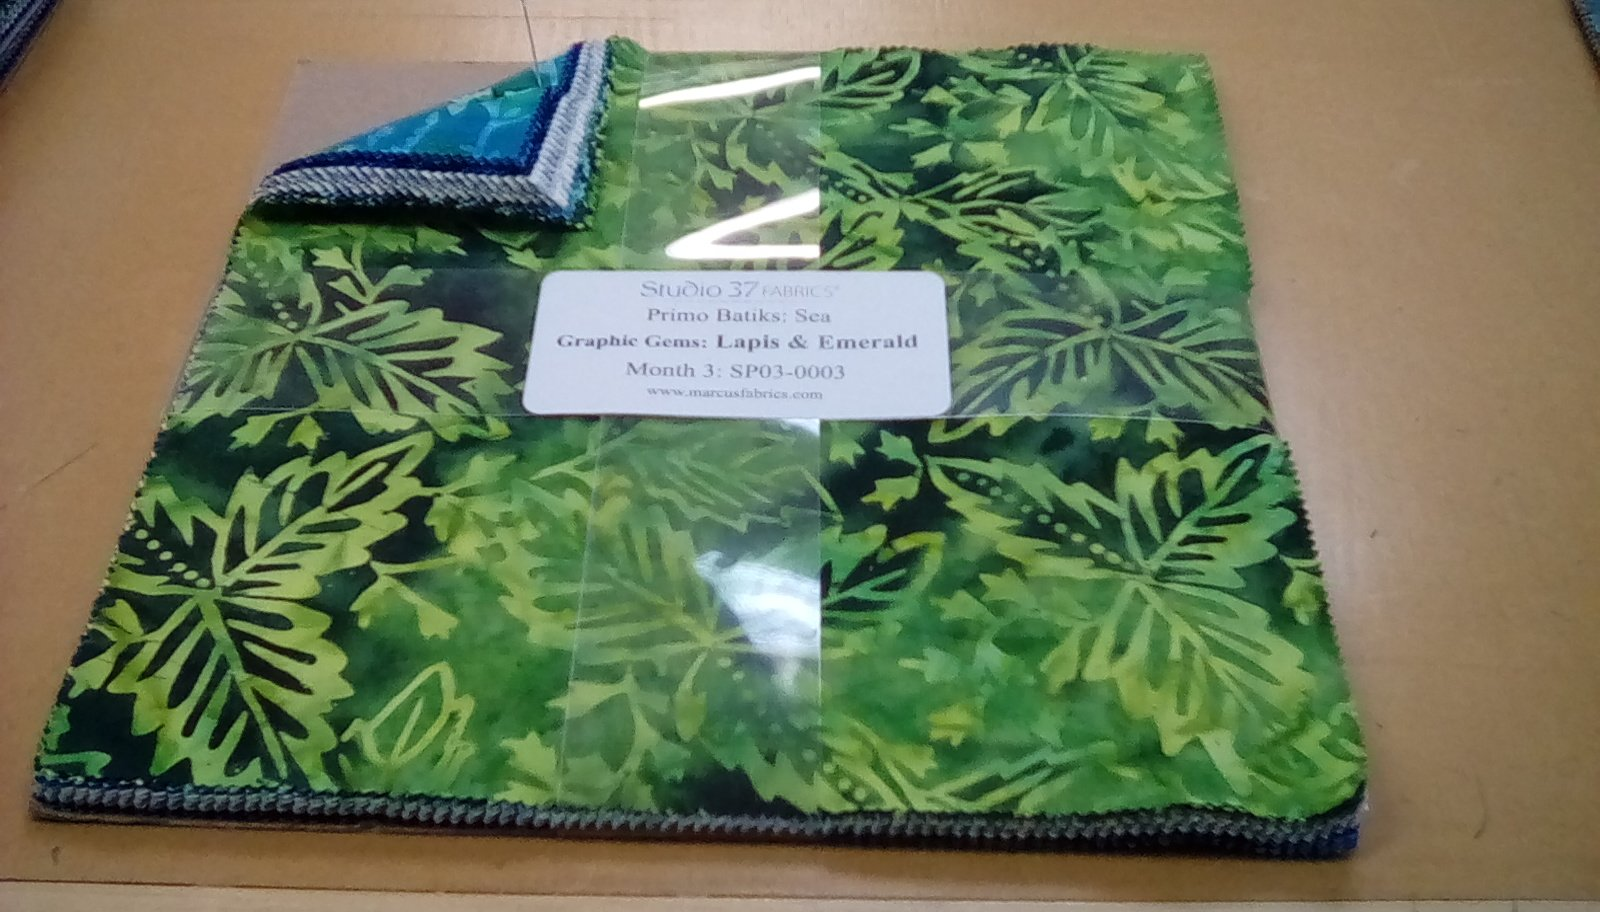 Primo Batiks:Sea Graphic Gems:Lapis & Emerald Month   3